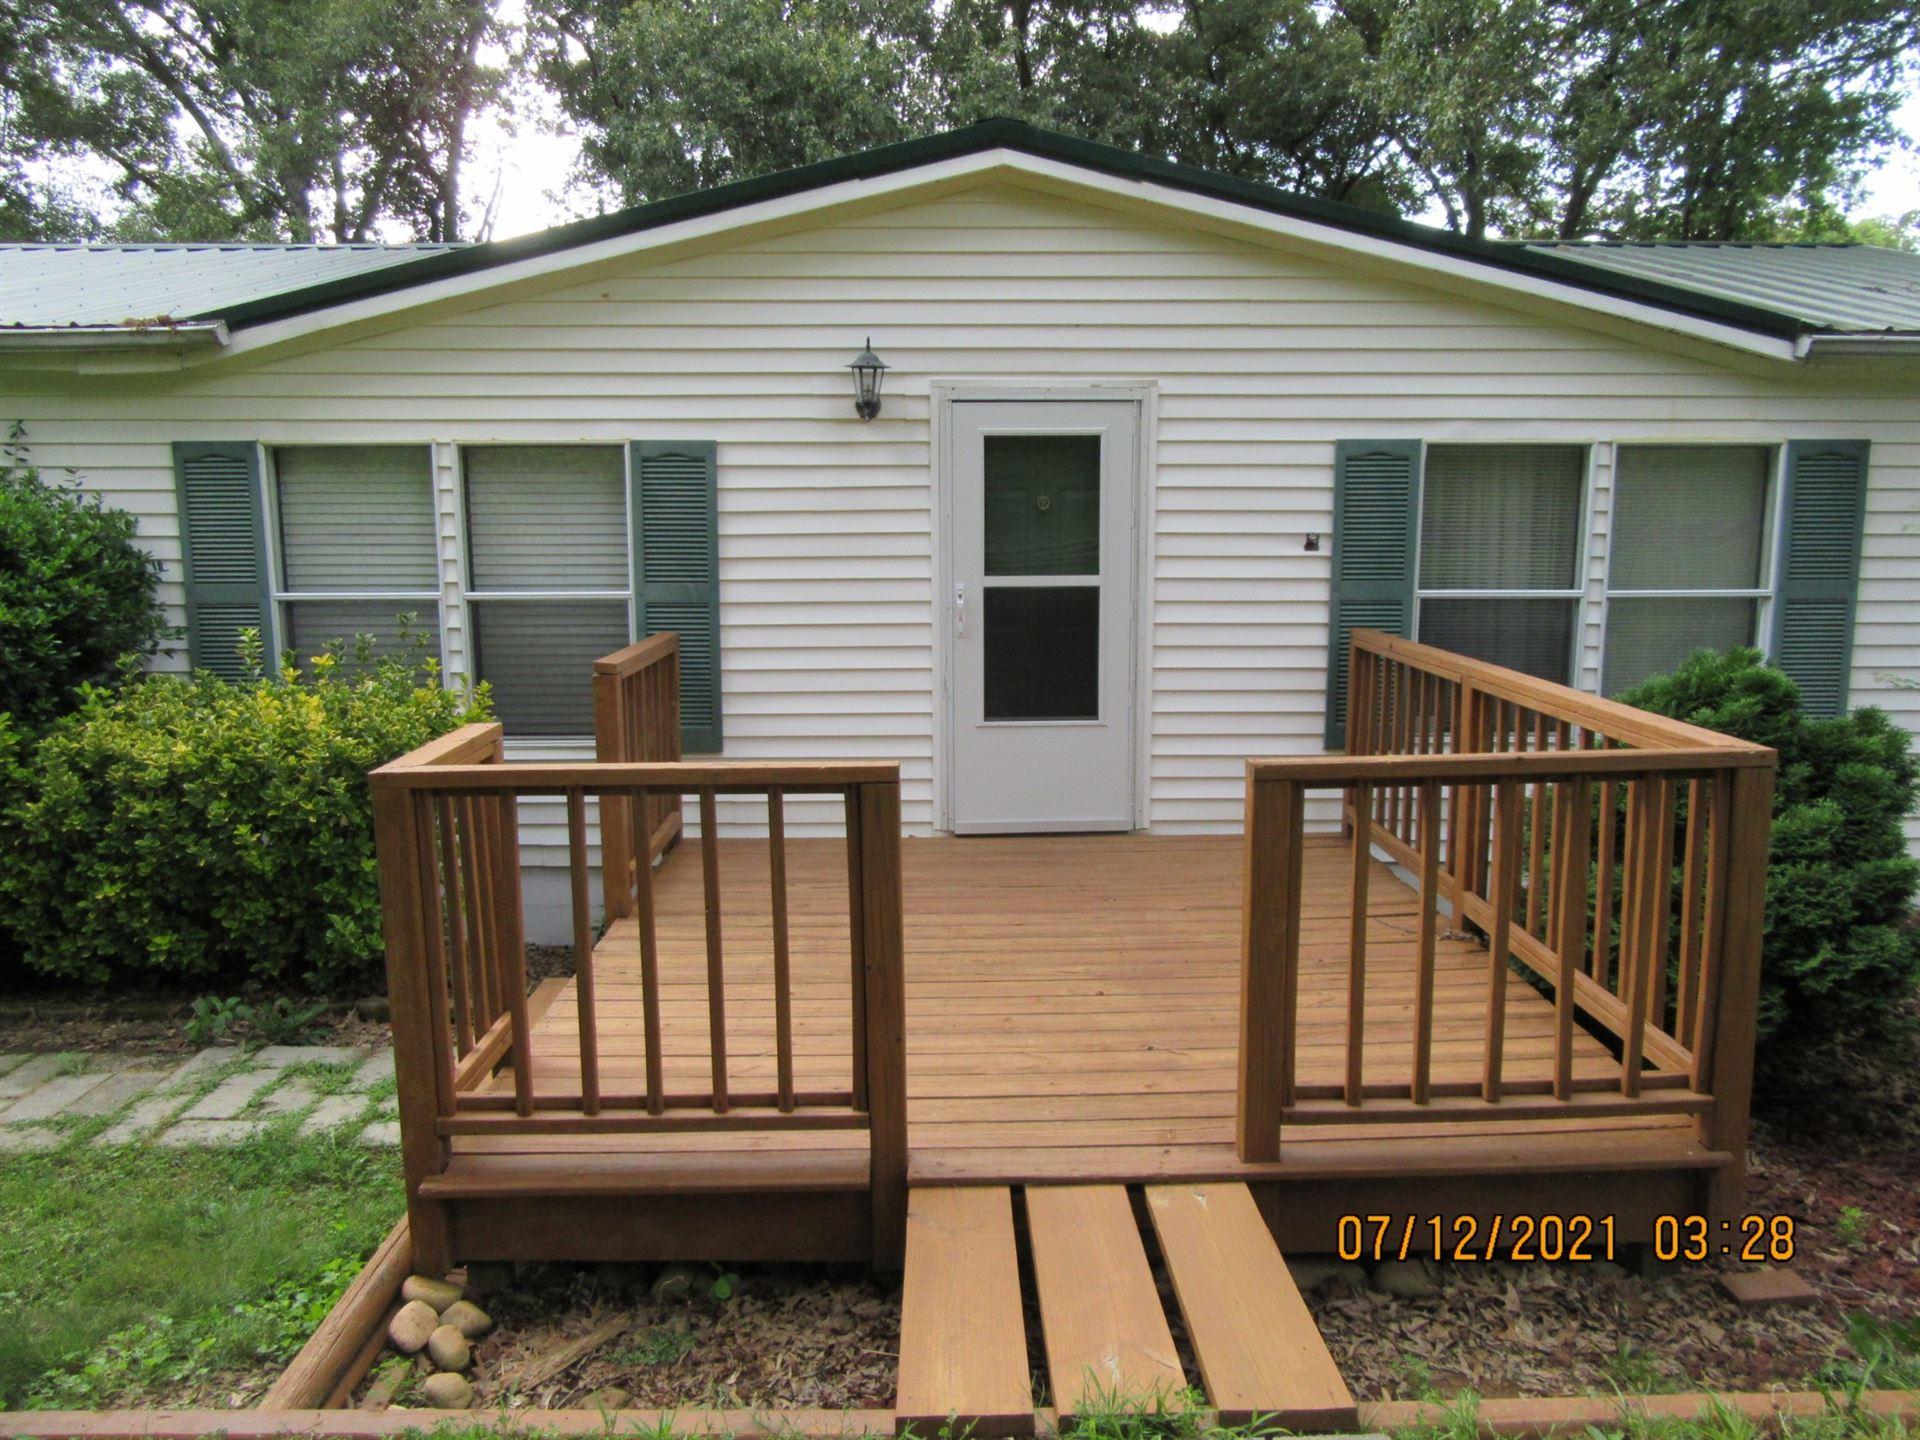 87 Heather Ln, McMinnville, TN 37110 - MLS#: 2271977